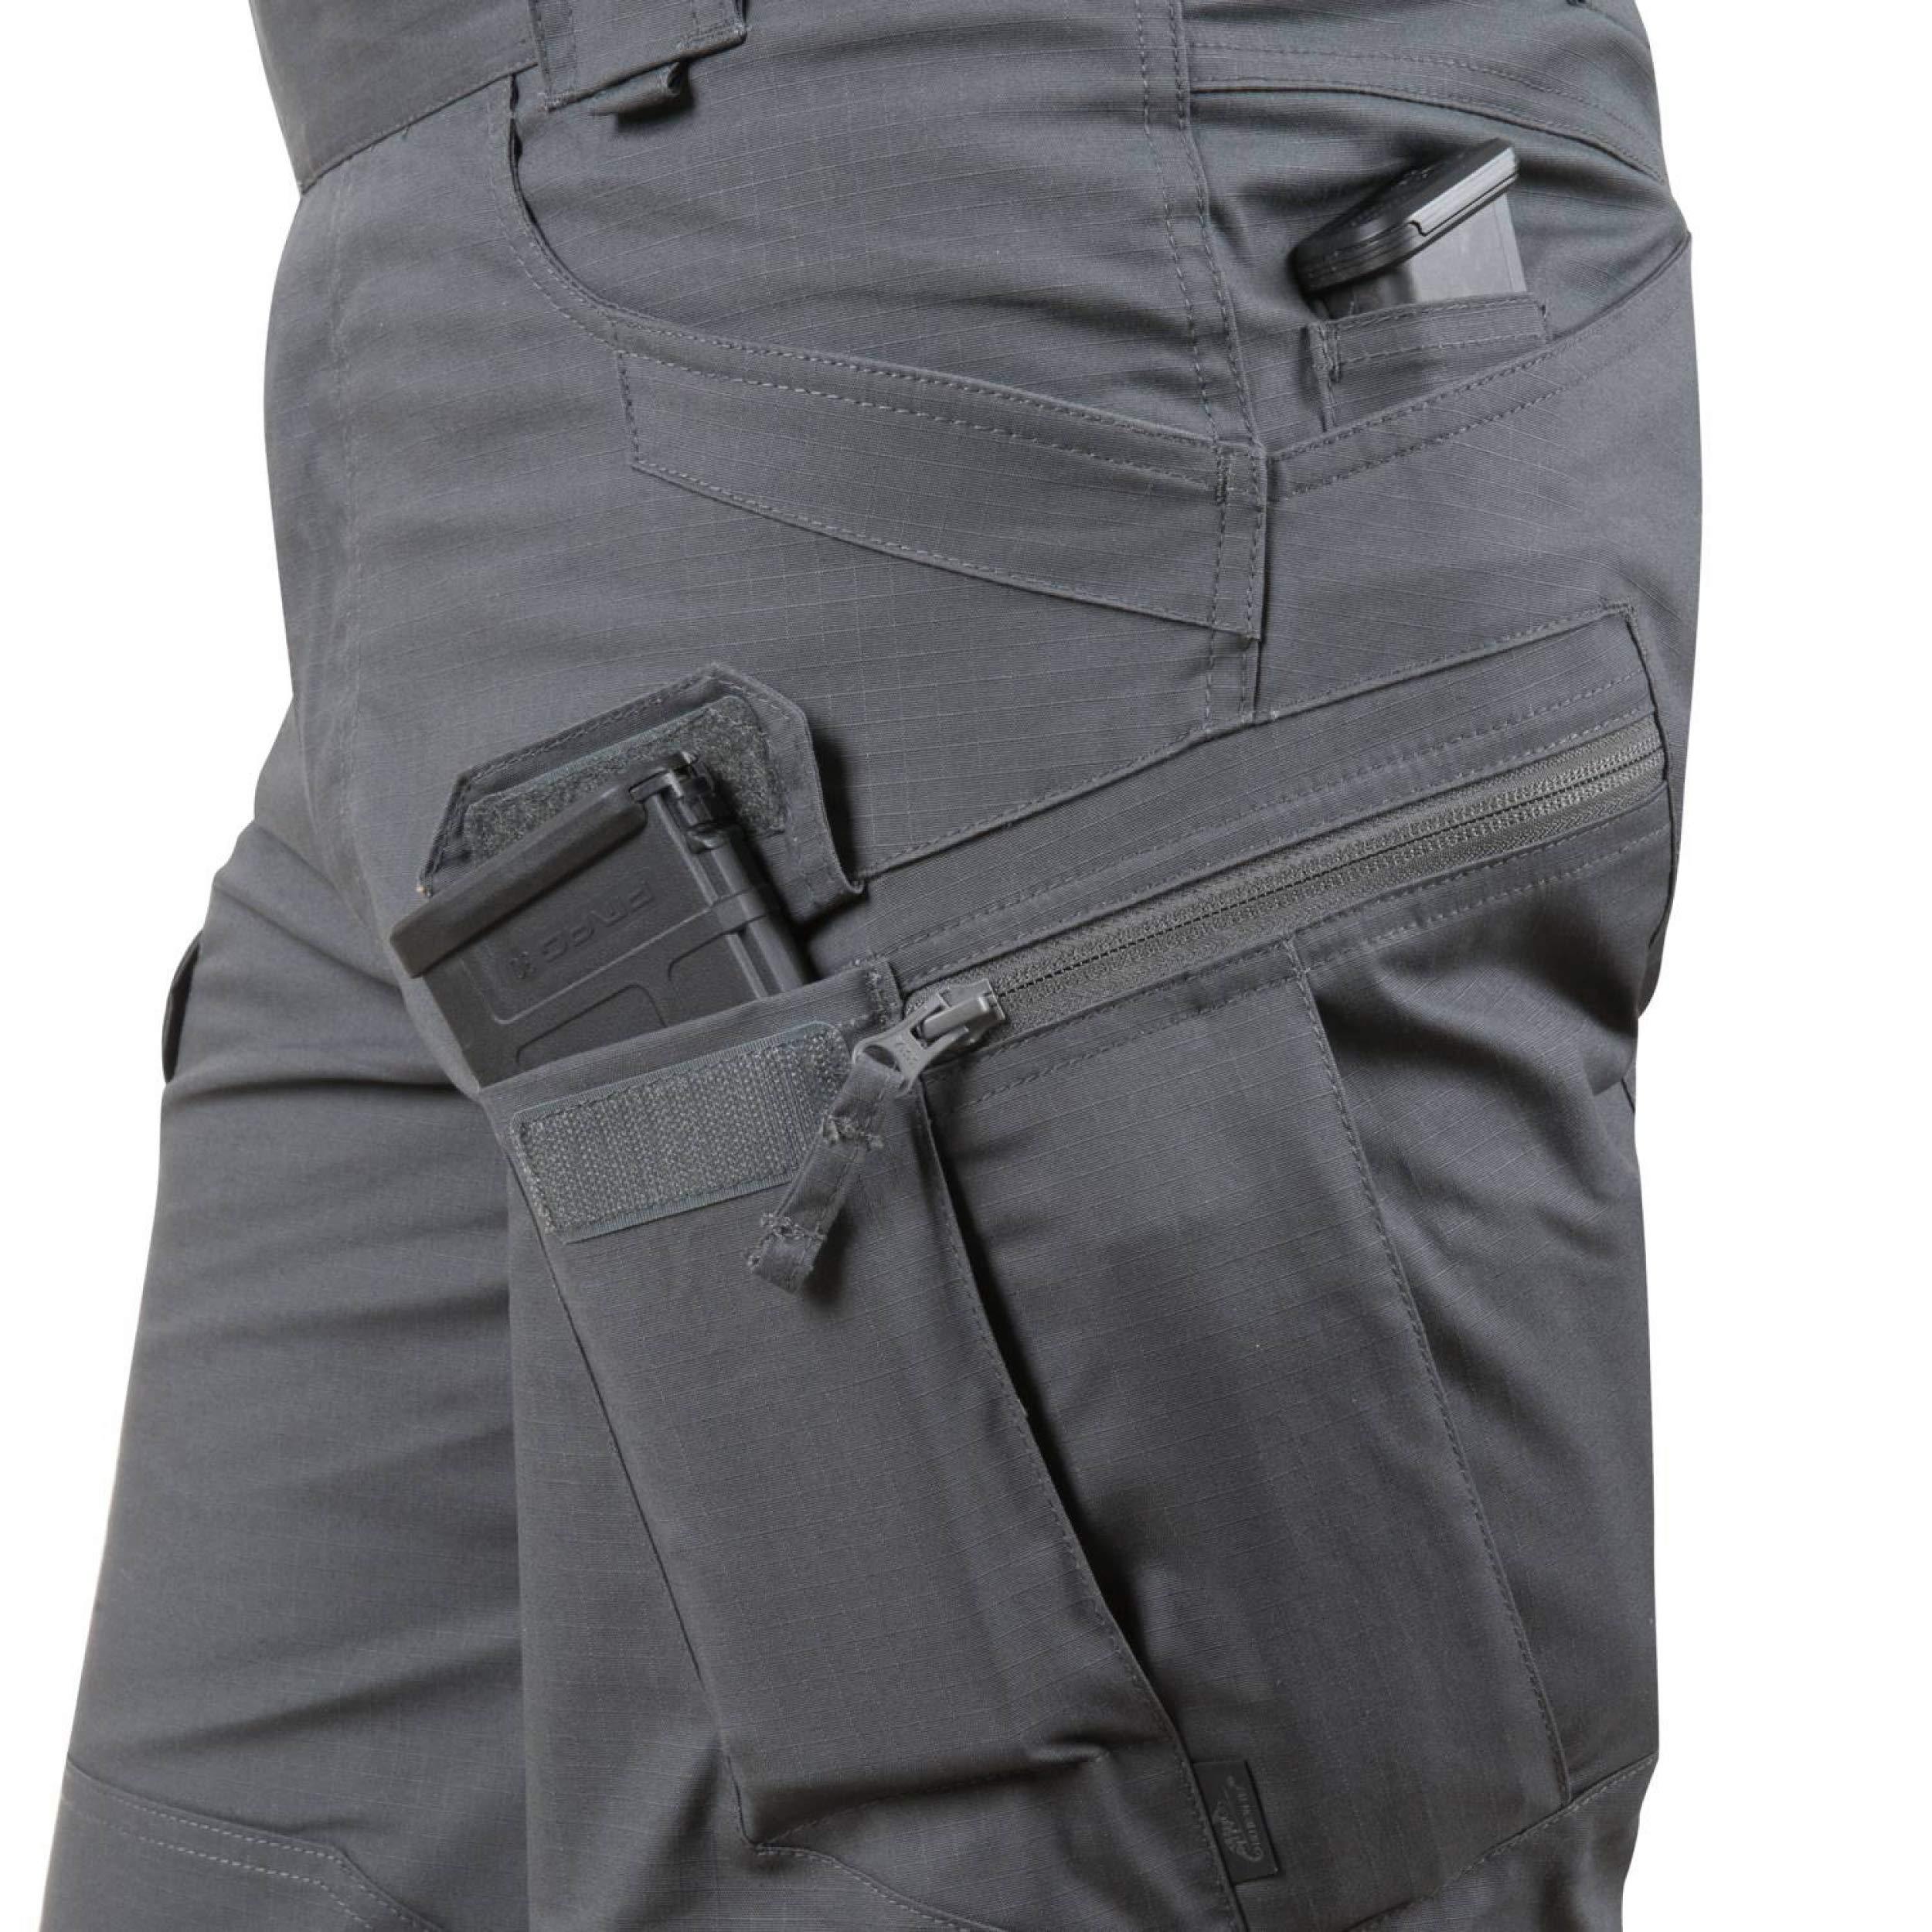 Taiga Green Helikon-Tex Urban Tactical Shorts 11 Polycotton Ripstop